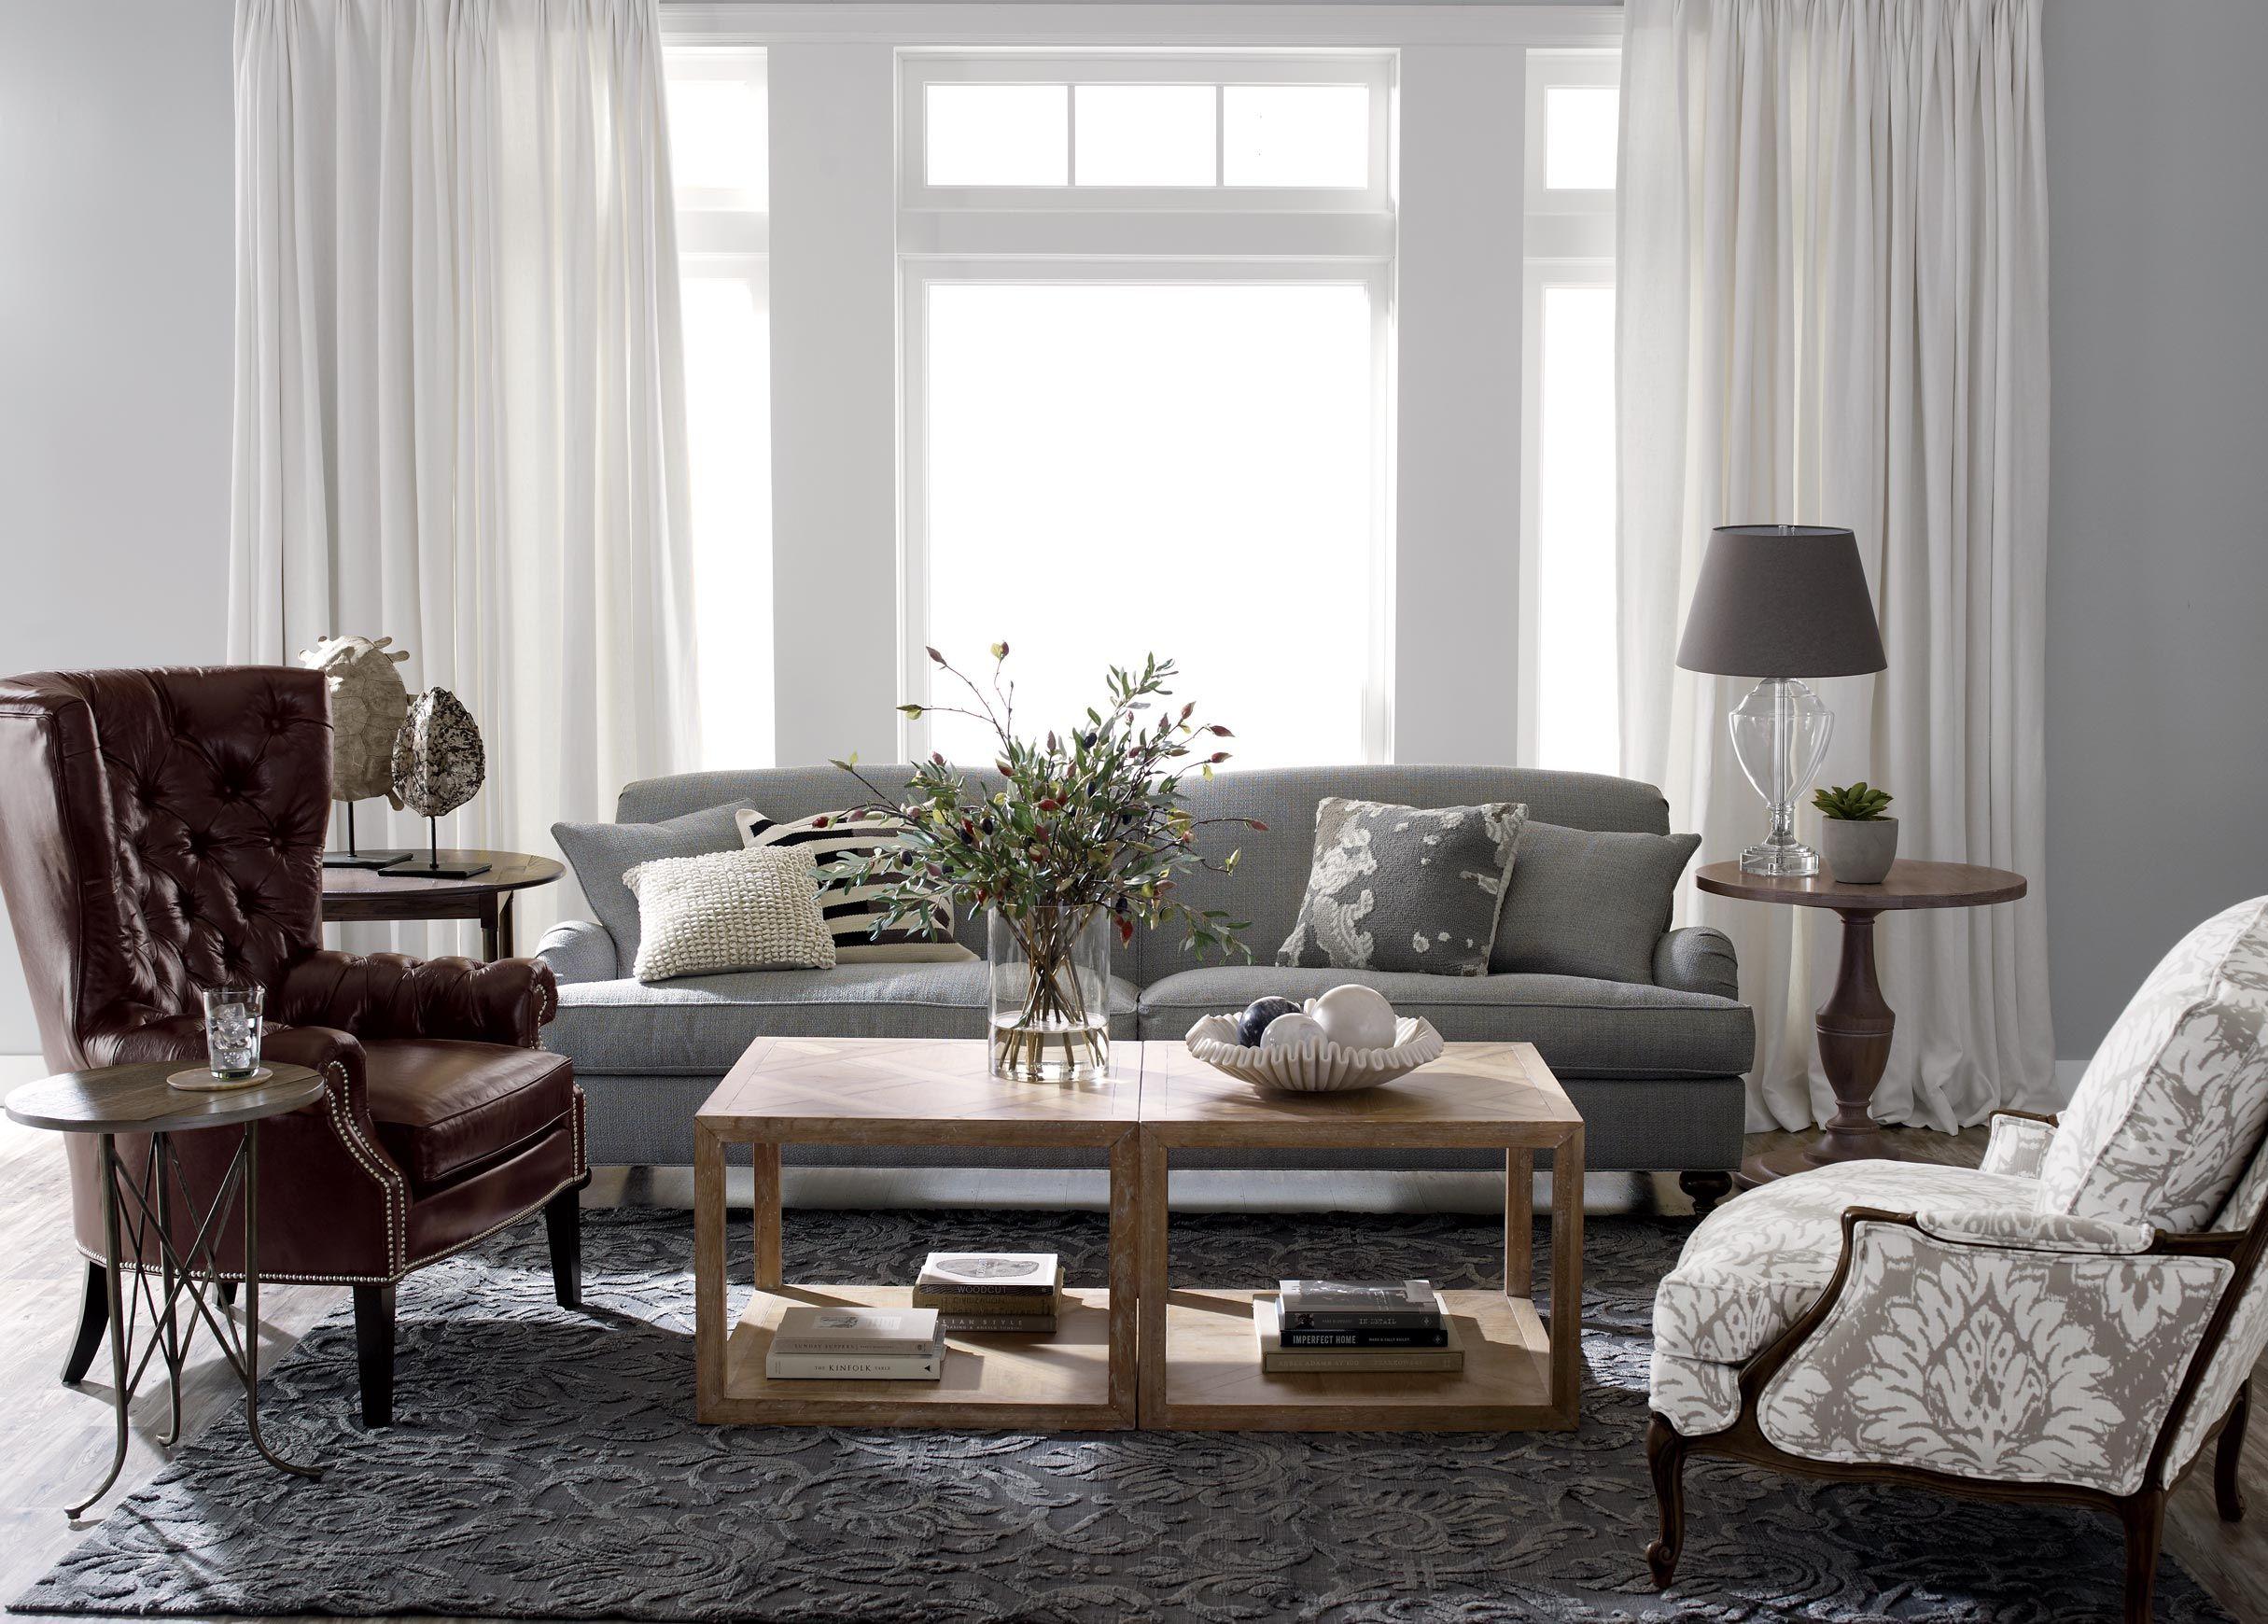 Ethan Allen Seats of Honor Living Room | http://www.ethanallen.com ...